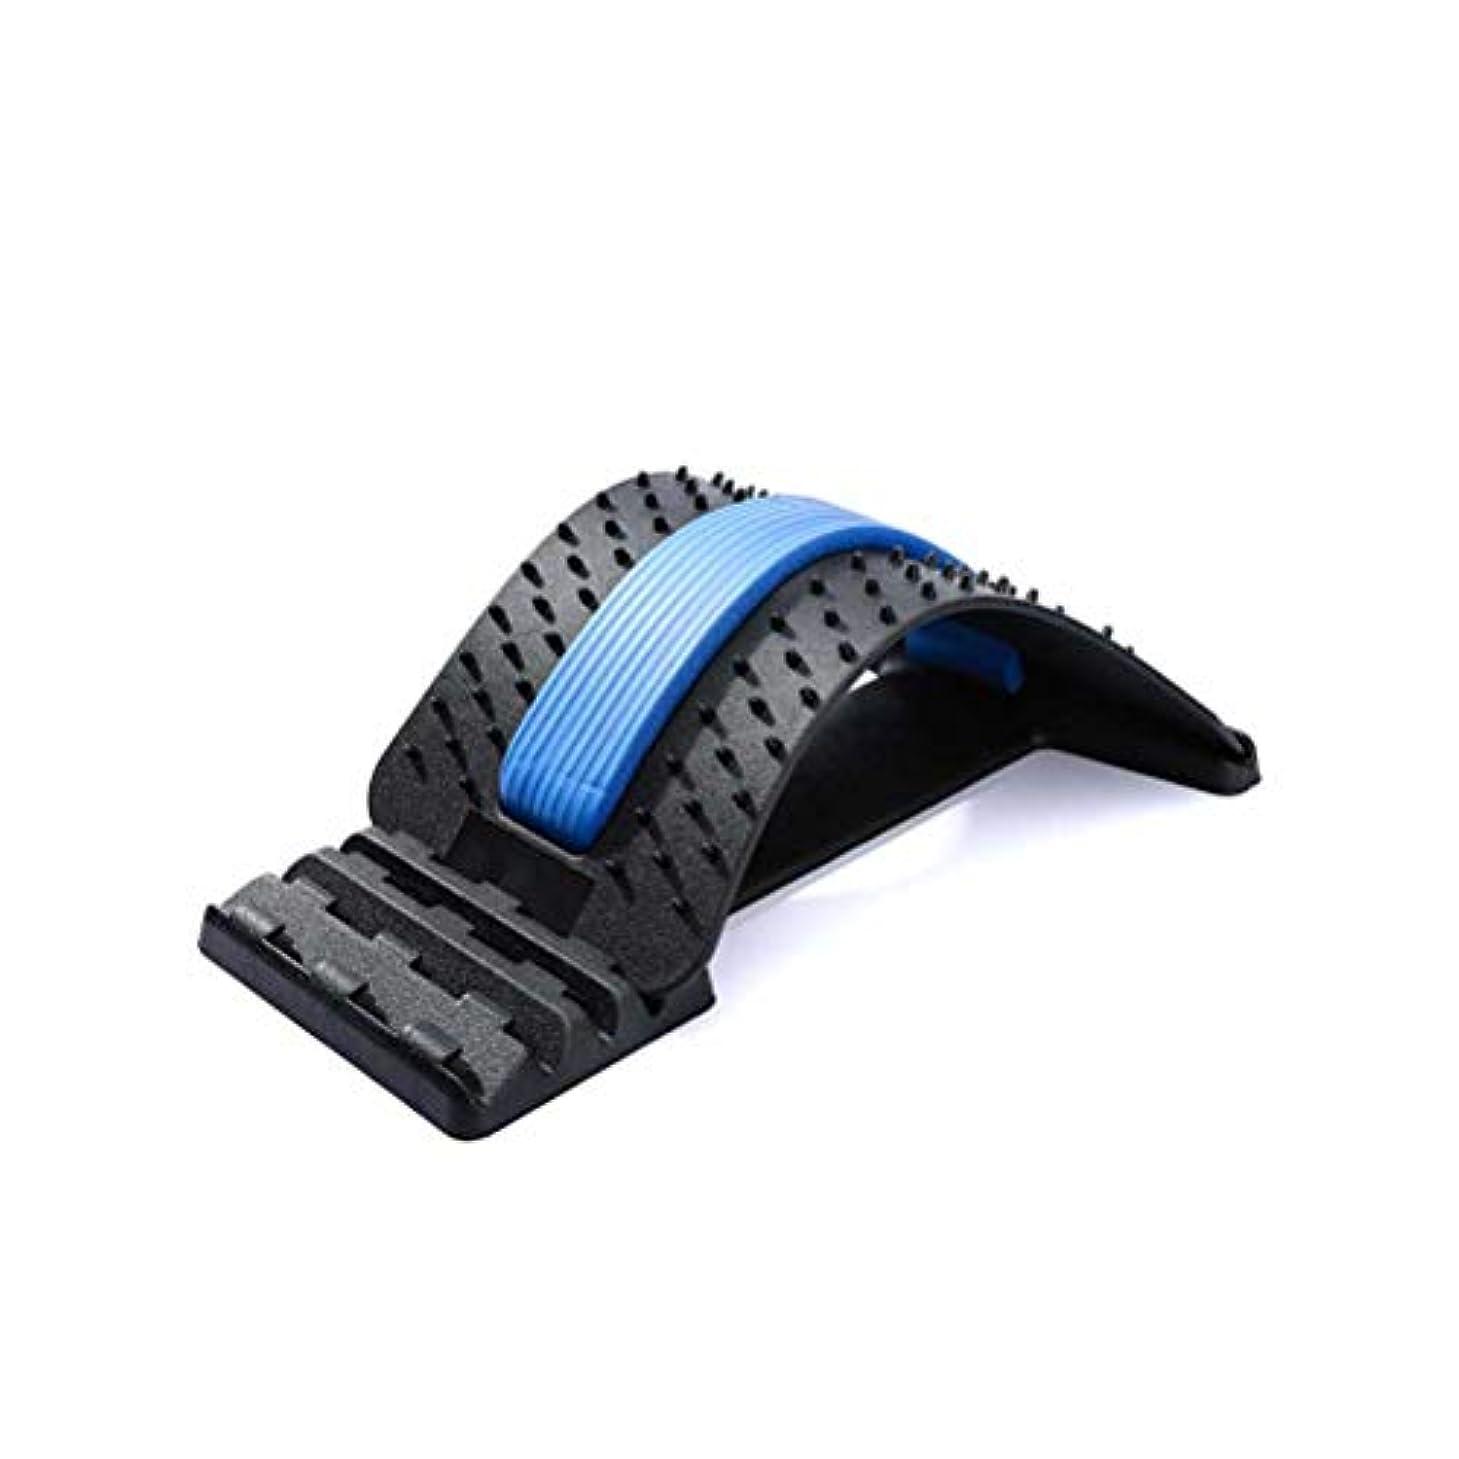 Healifty バックストレッチャー脊椎の痛みを軽減する腰椎牽引ストレッチングデバイス姿勢矯正具